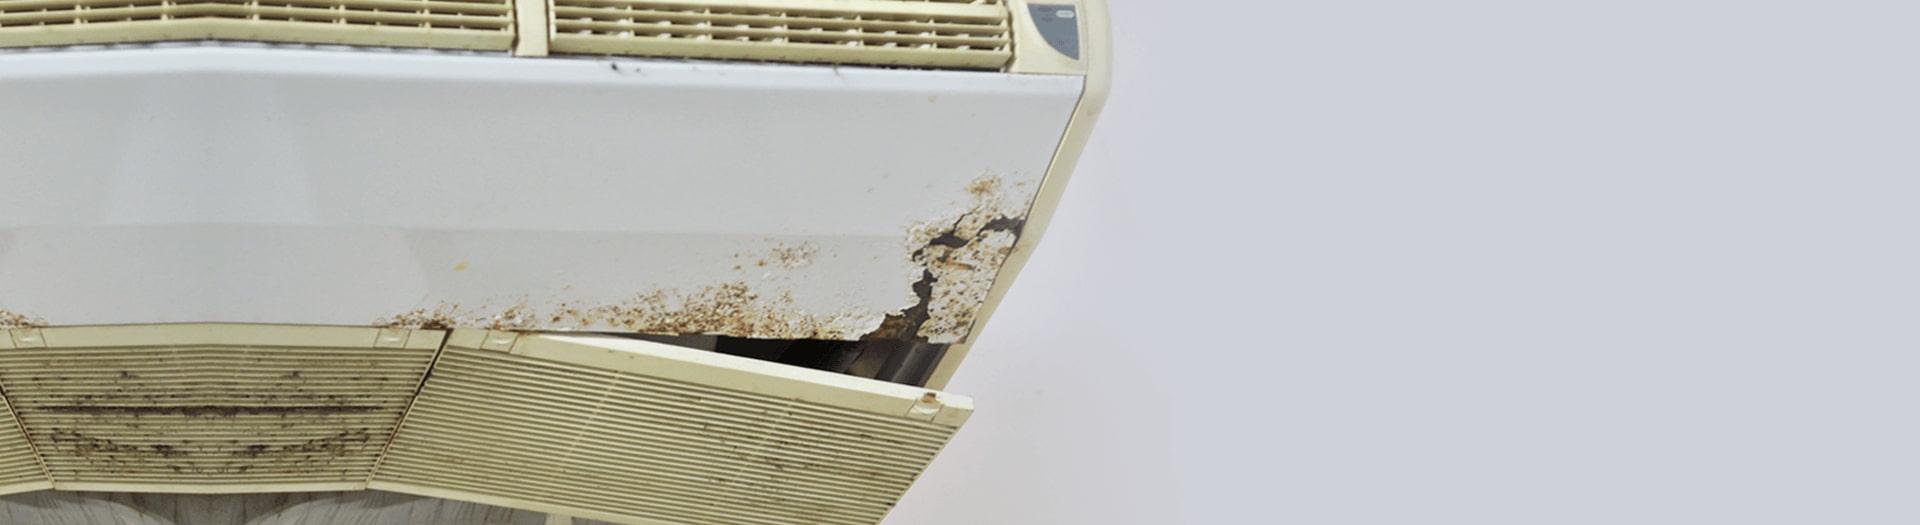 appliance-banner